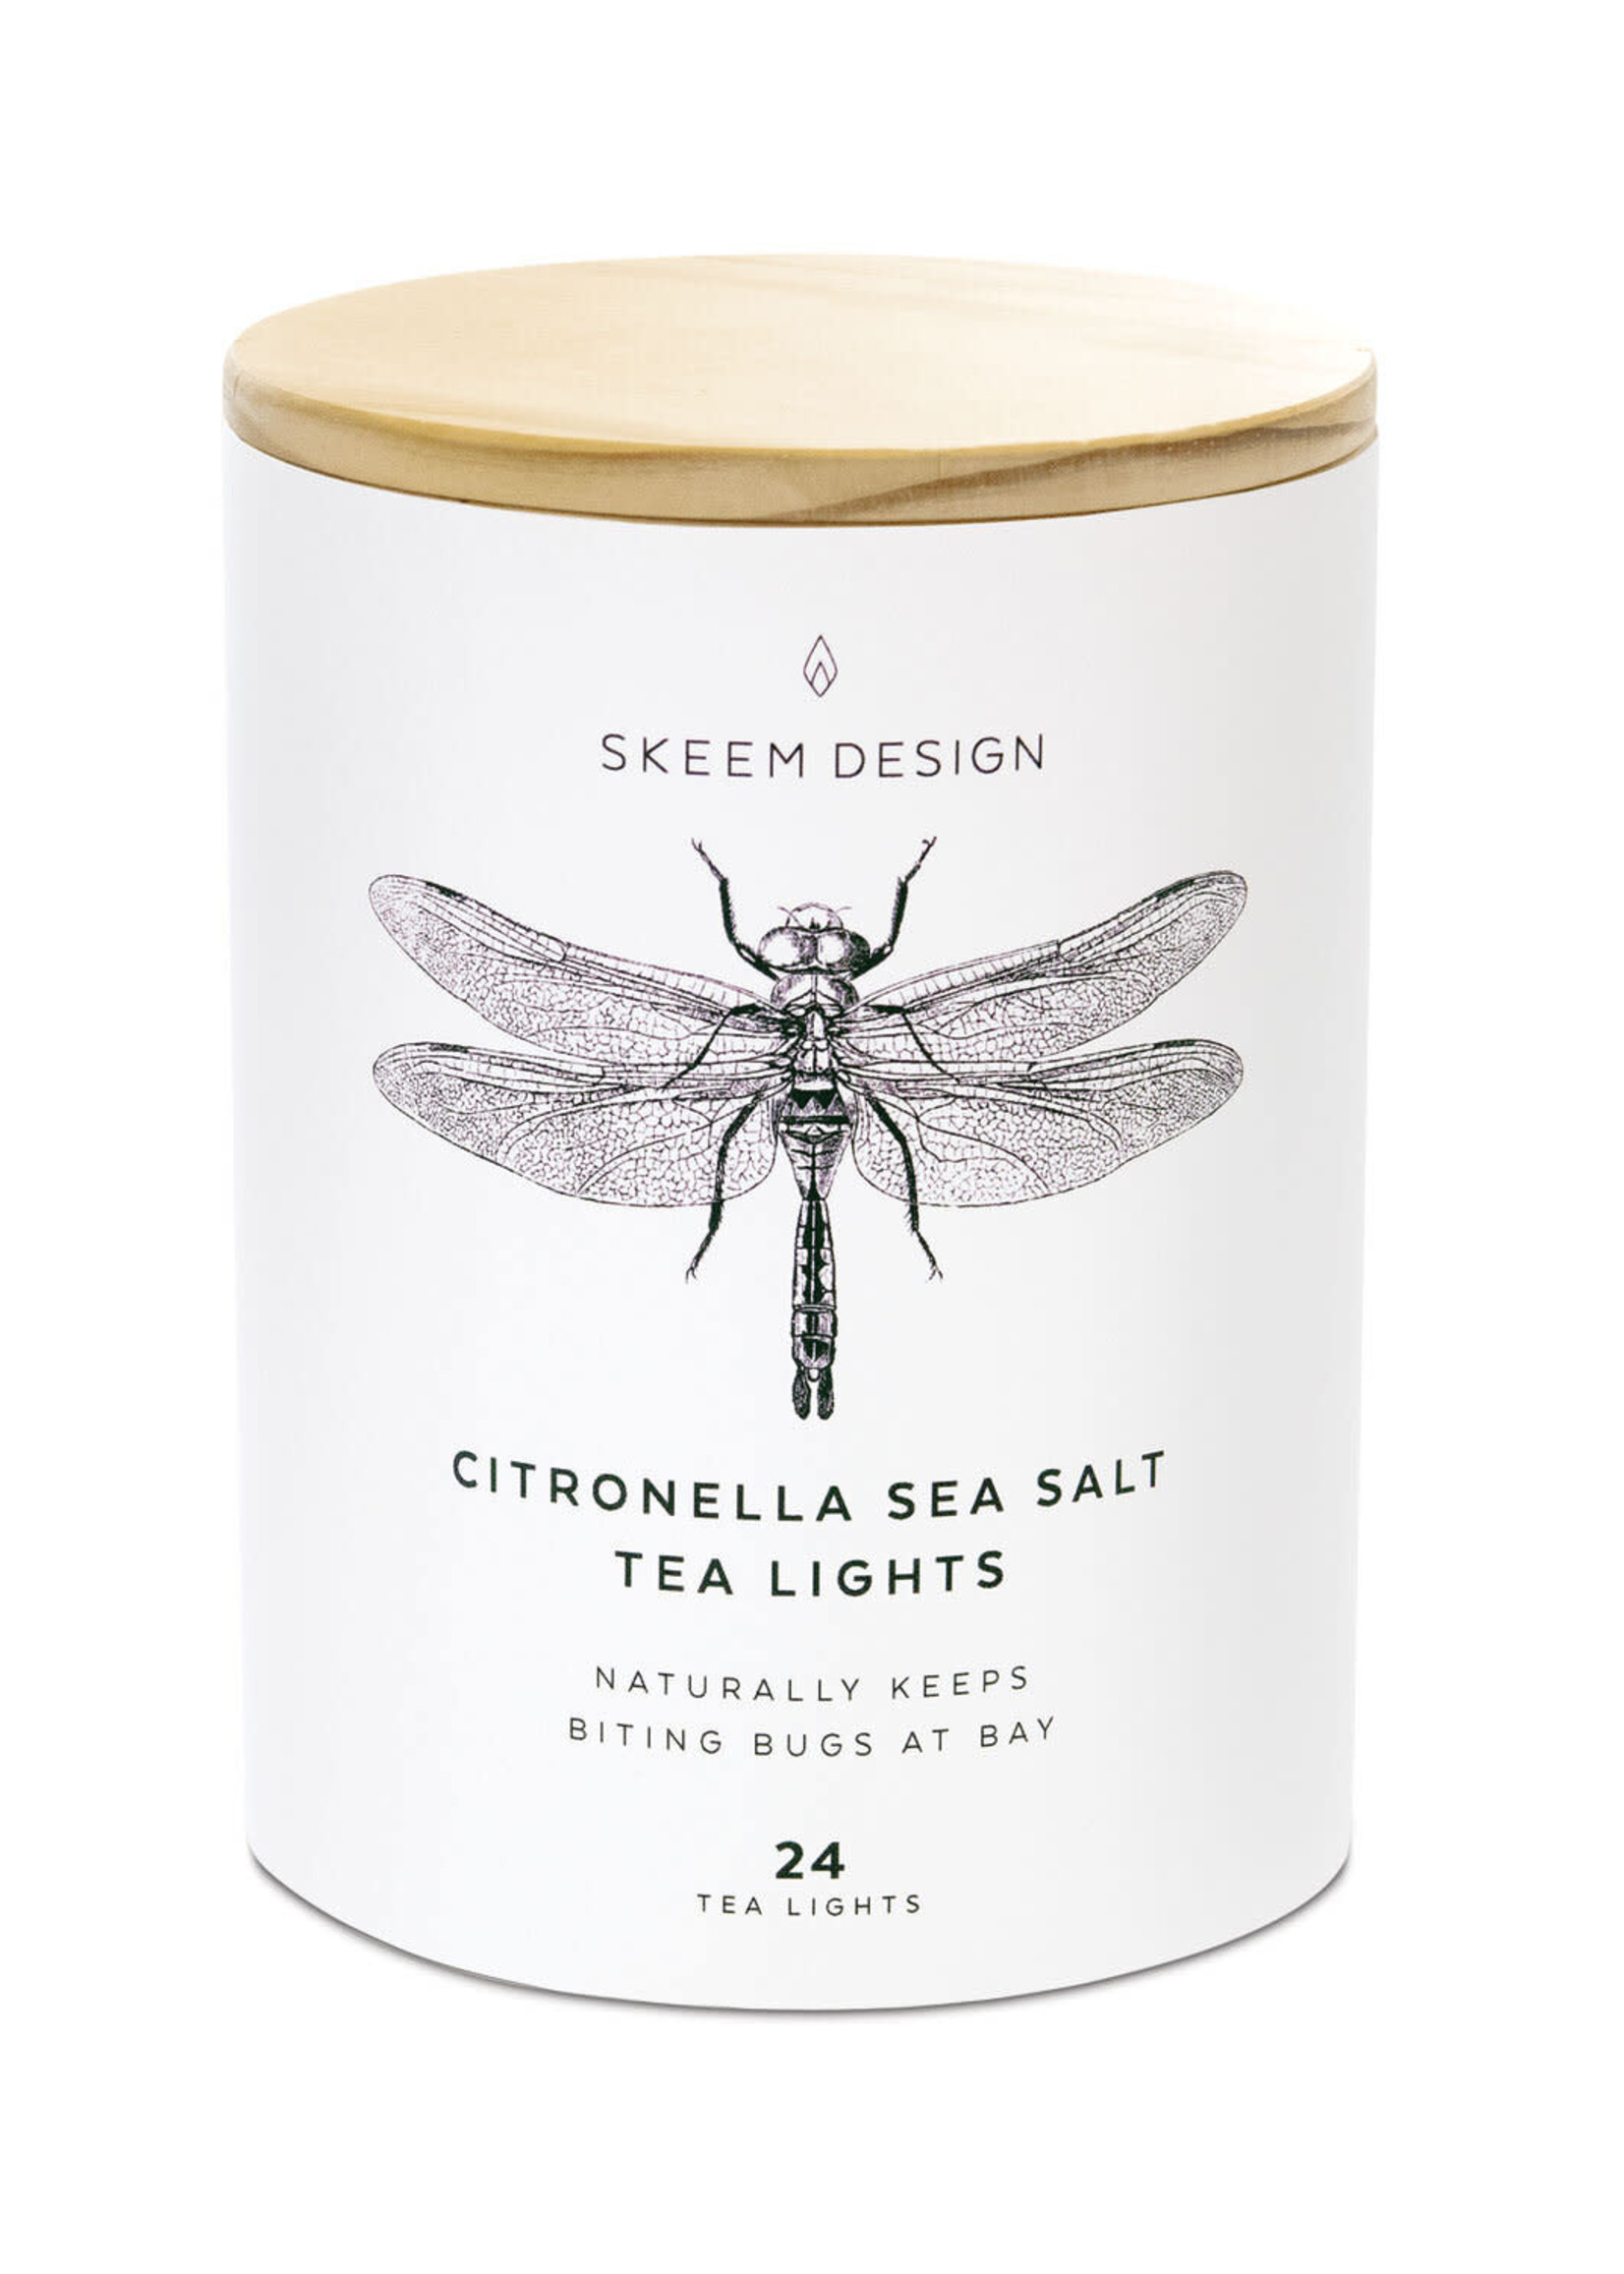 Citronella tea light candle: set of 24